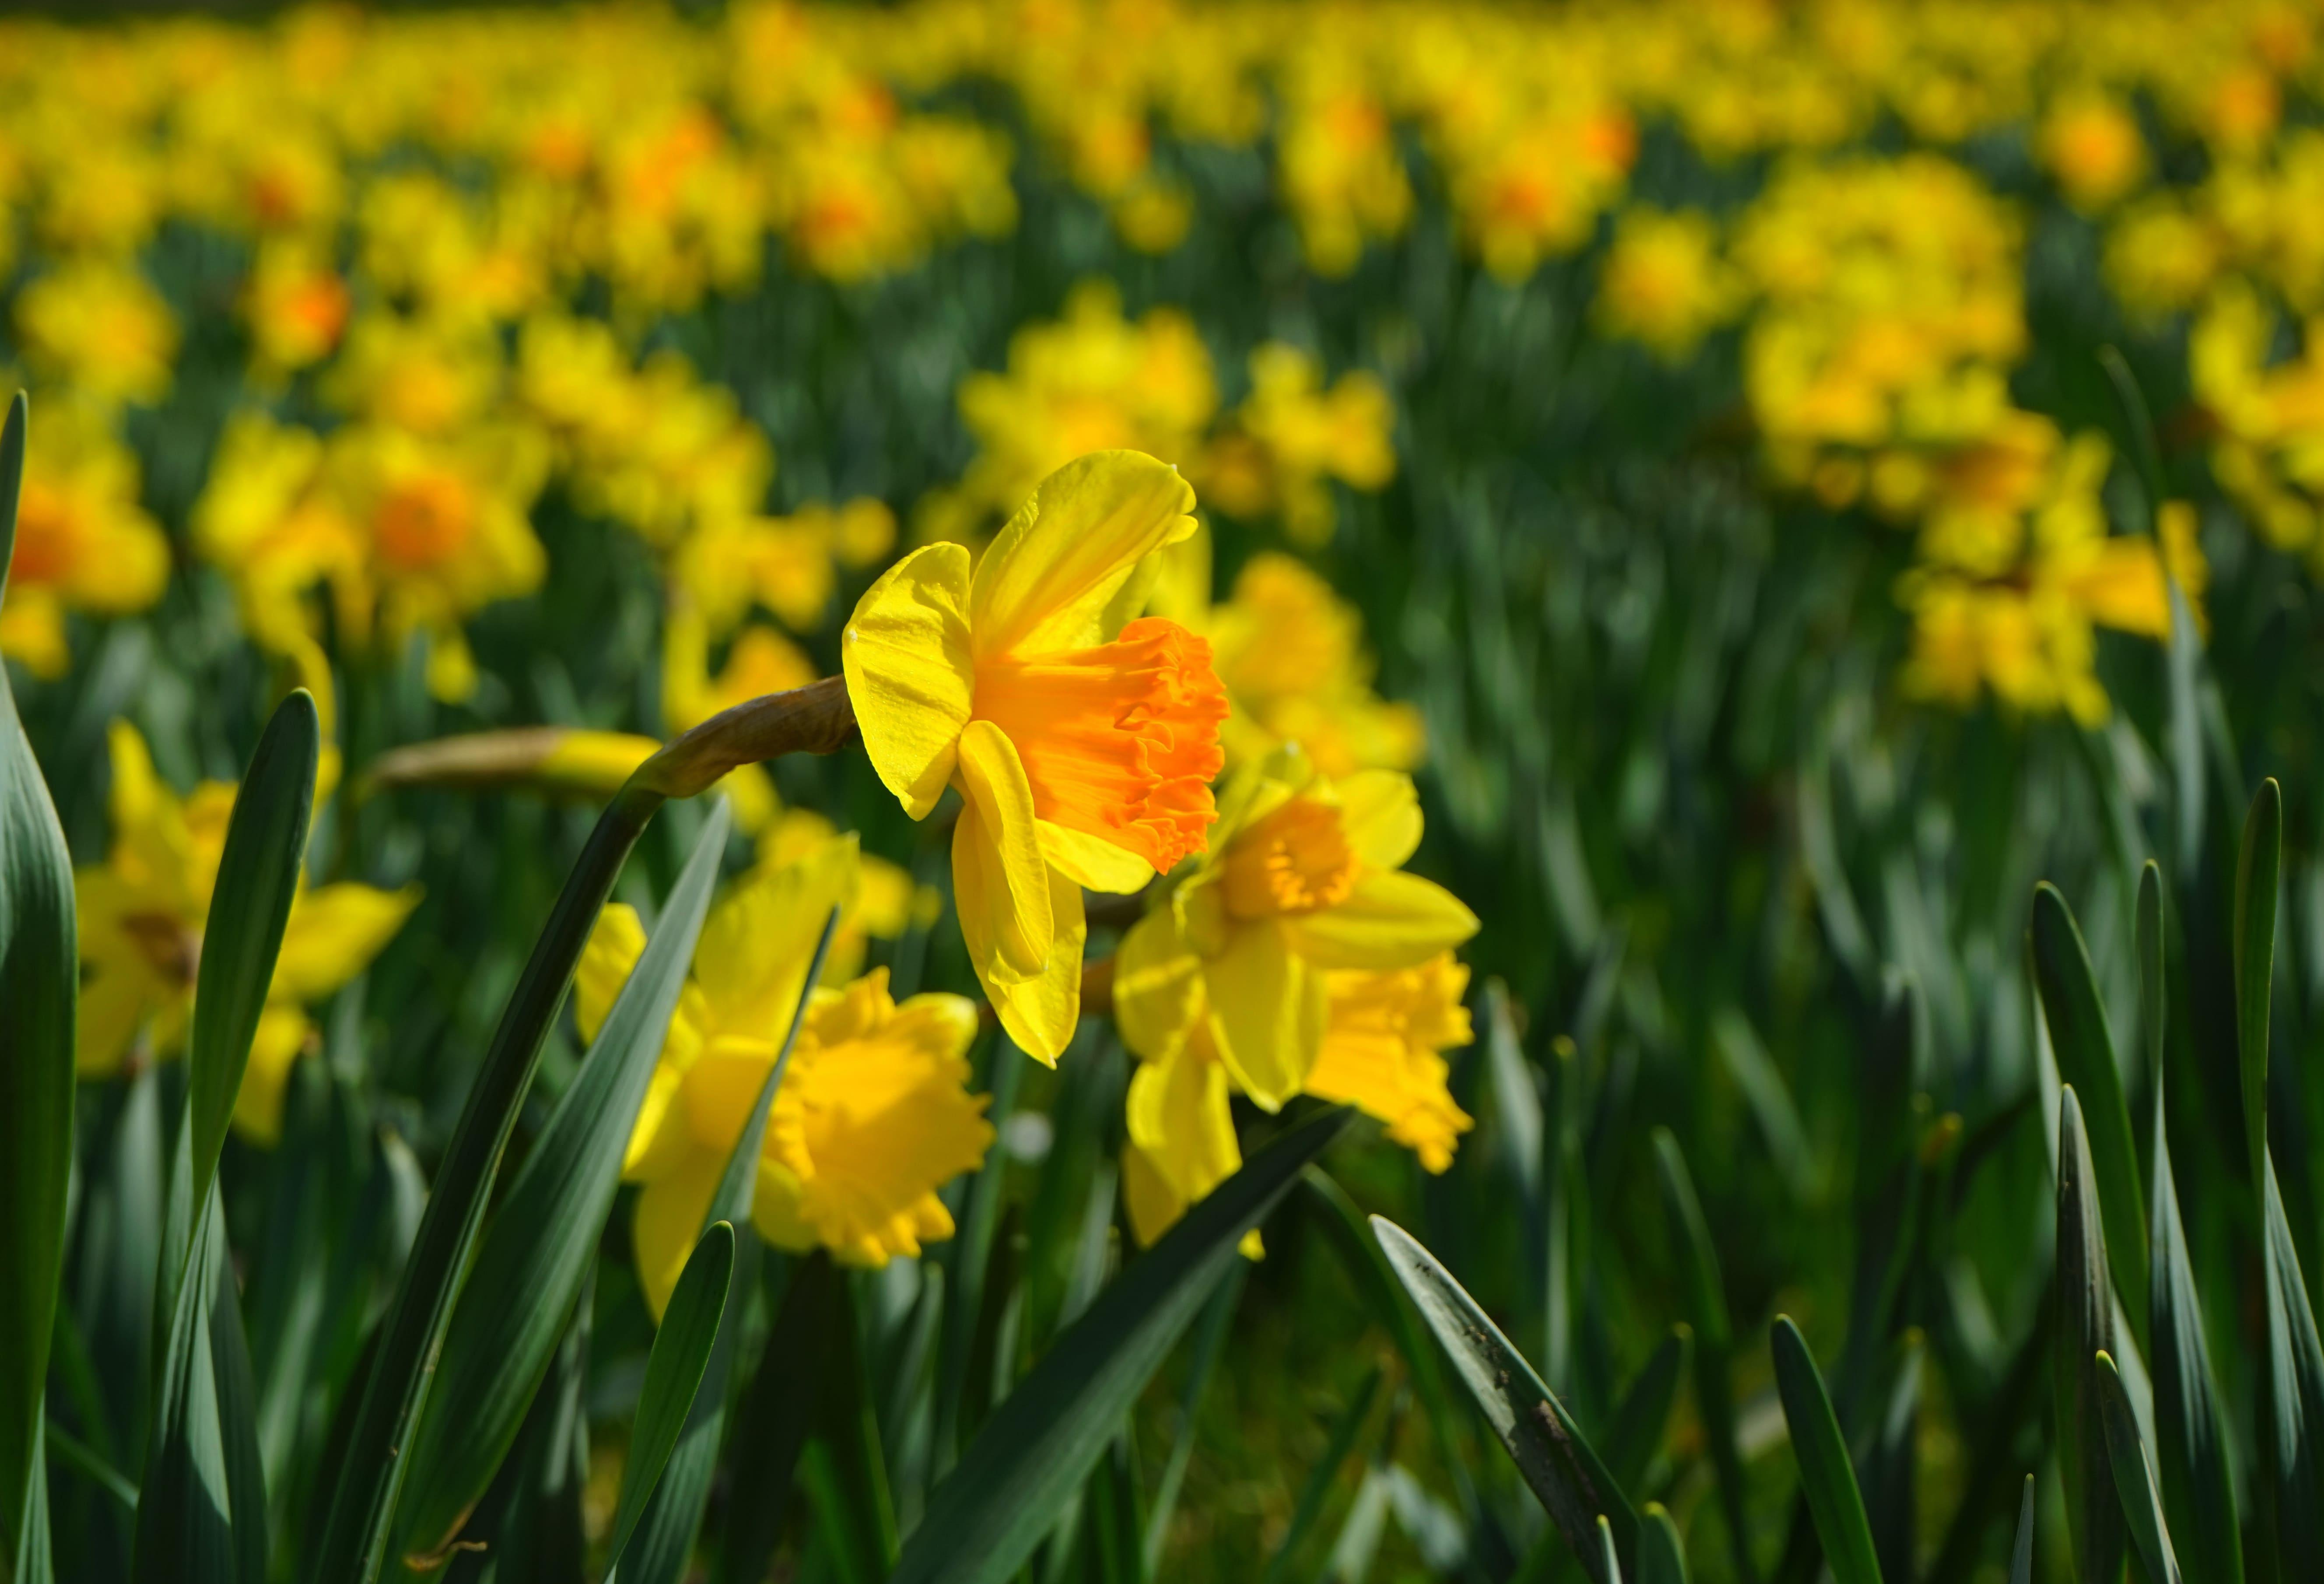 daffodils-photo-24